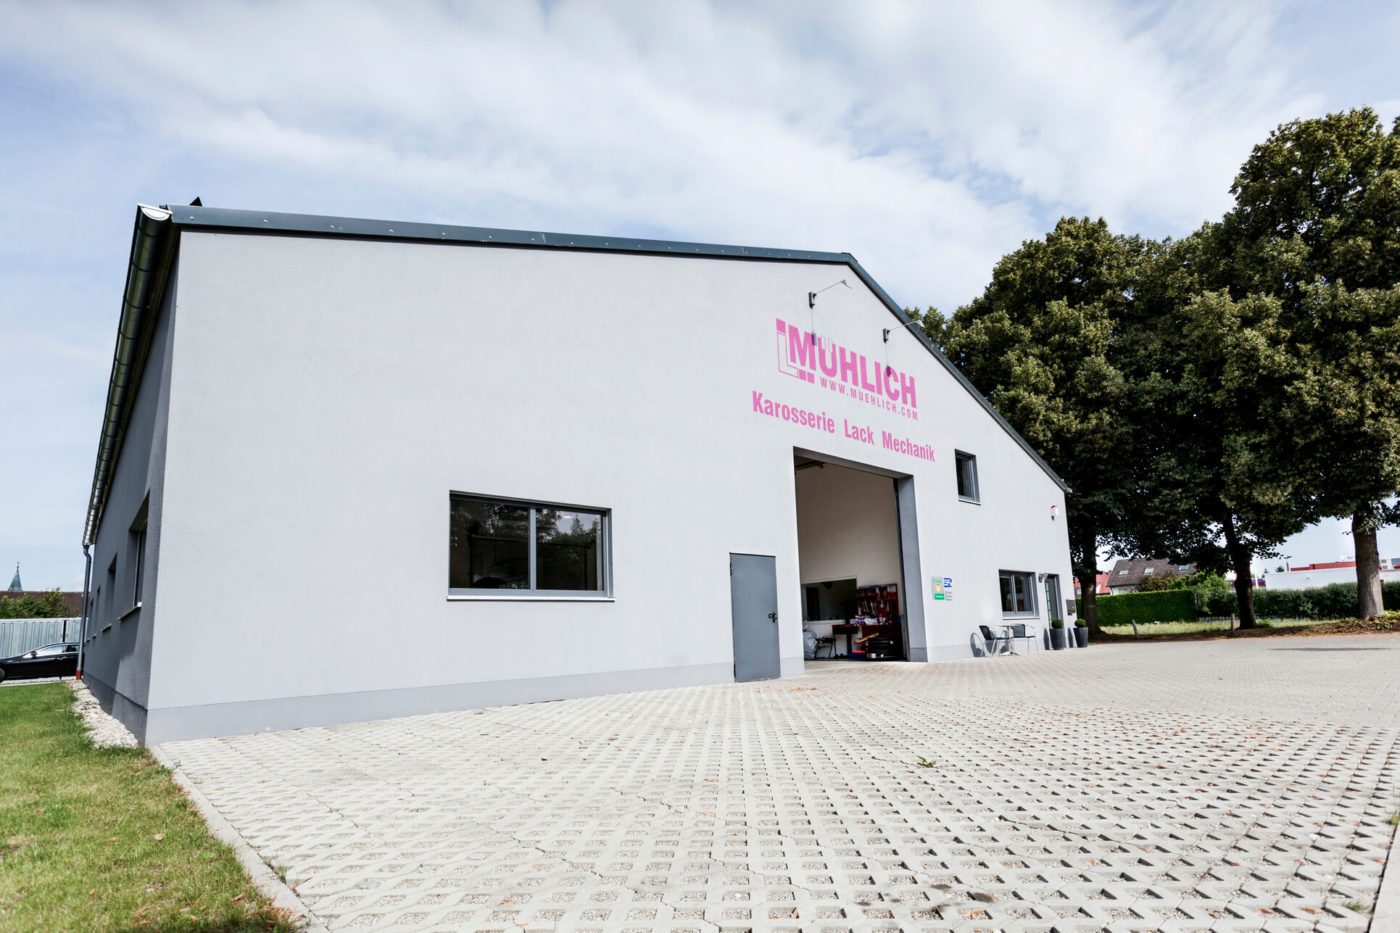 Mühlich Karosserie - Lack - Mechanik in Freising Meisterbetrieb